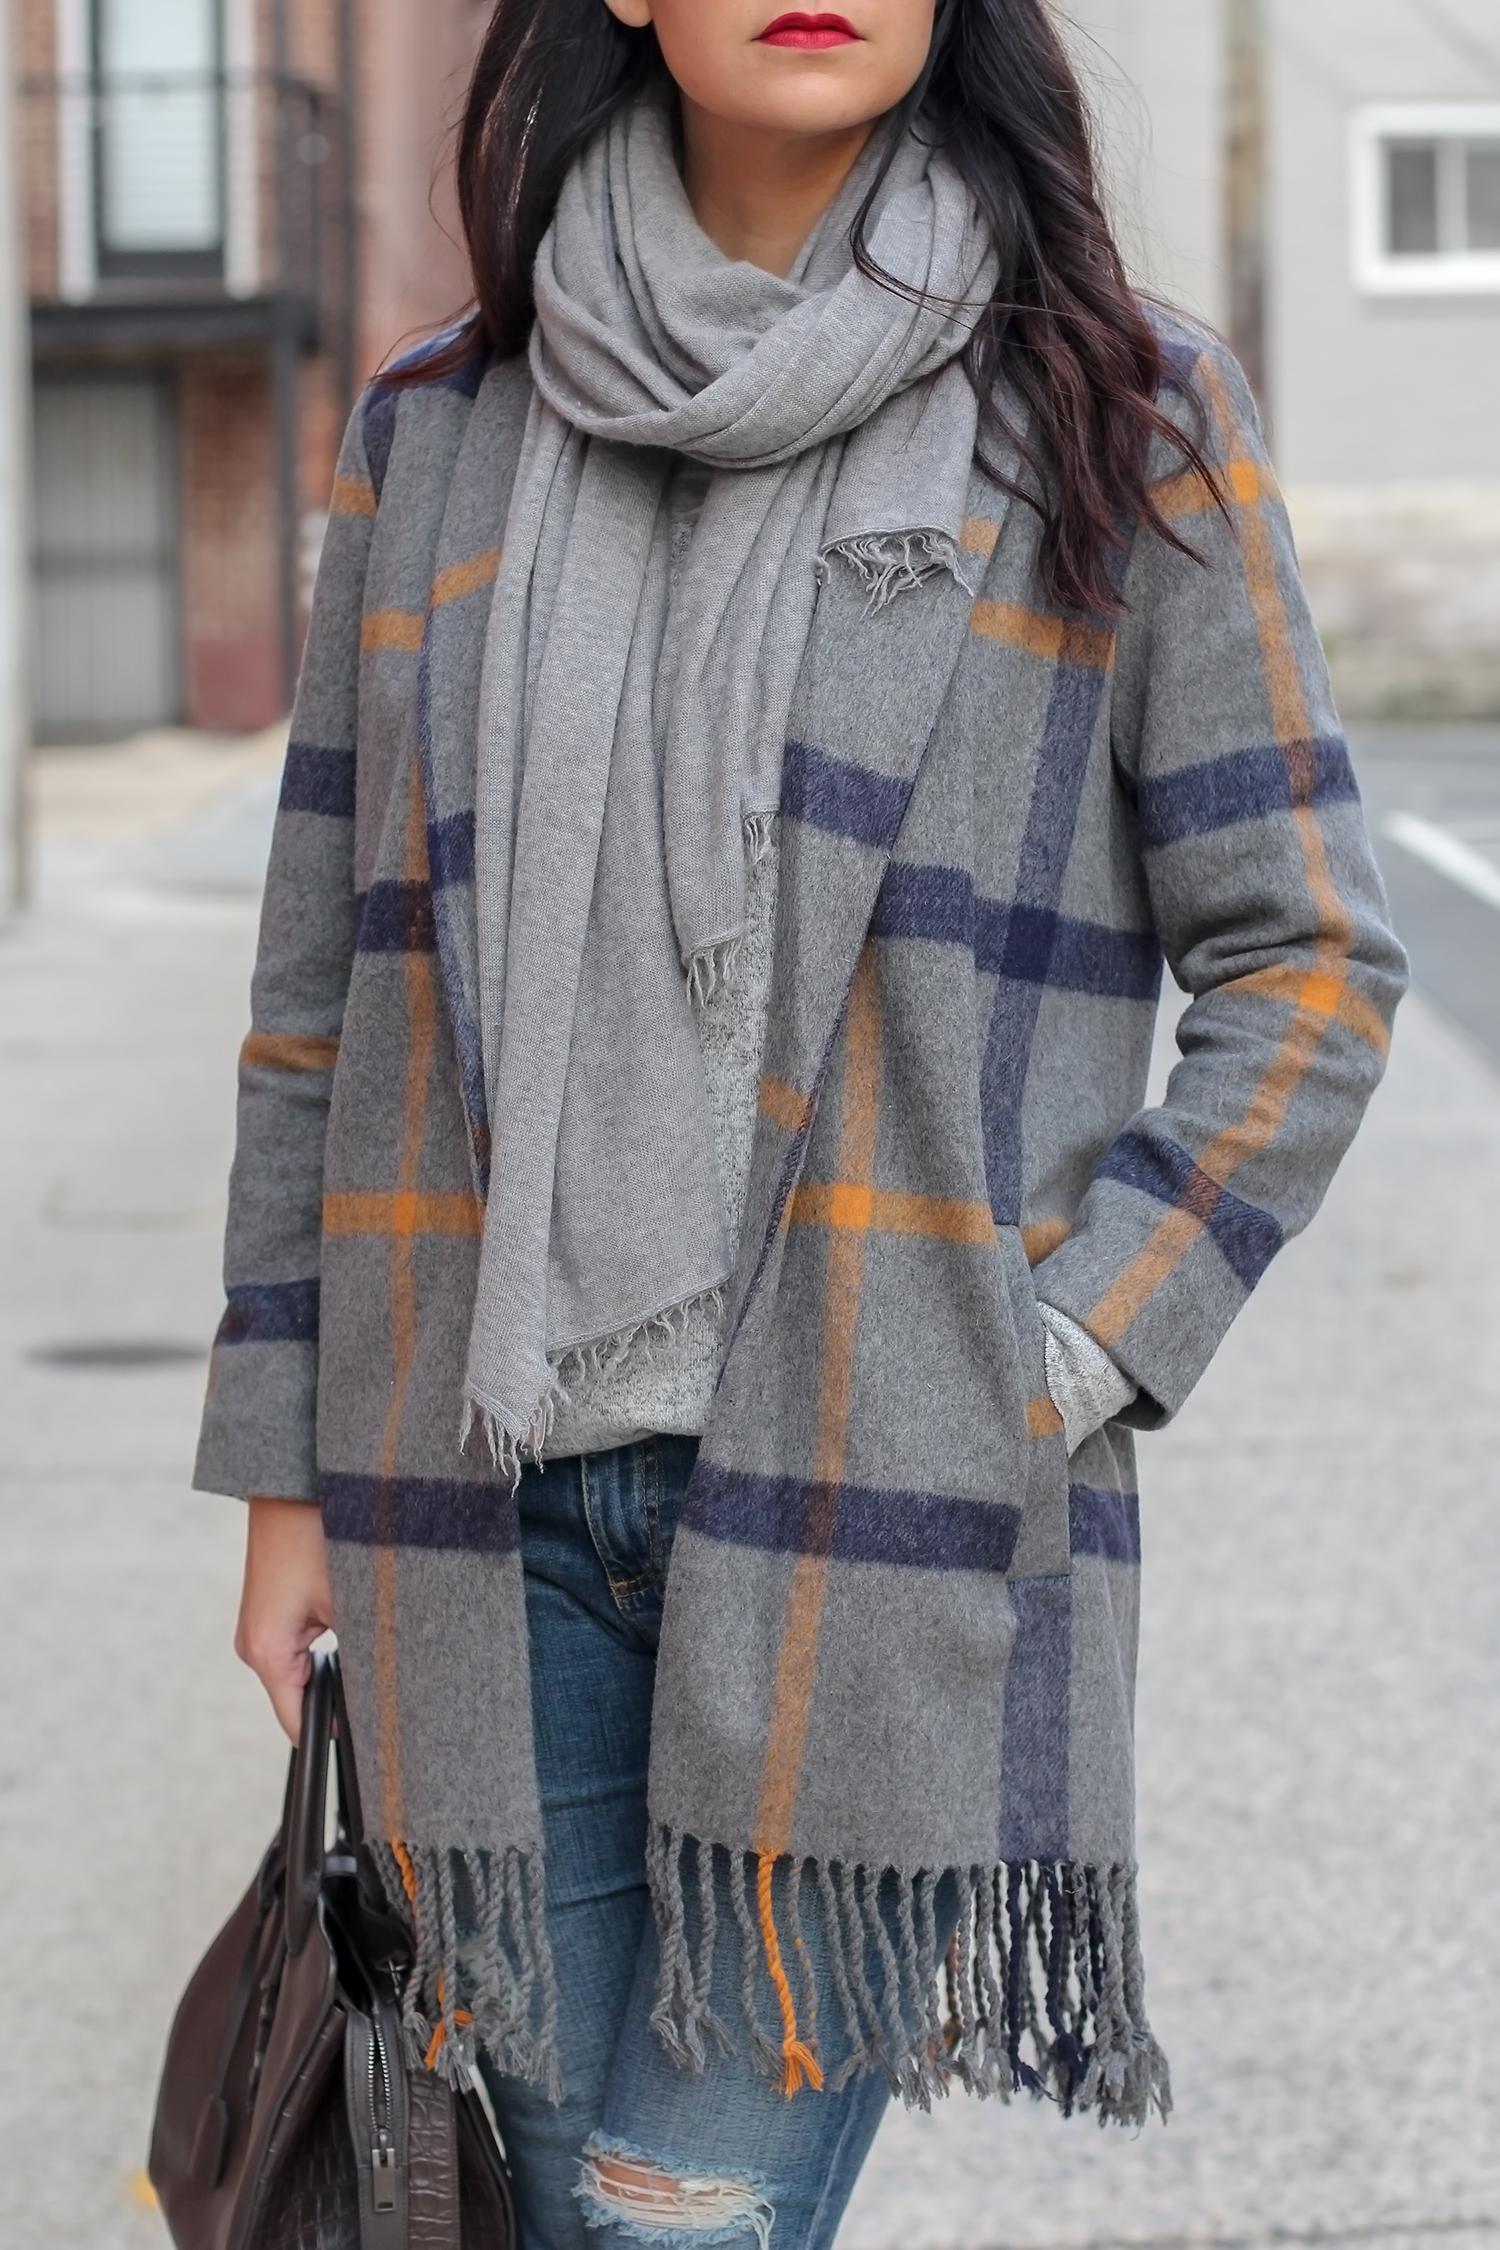 Layering in Fall, Fringe Coat